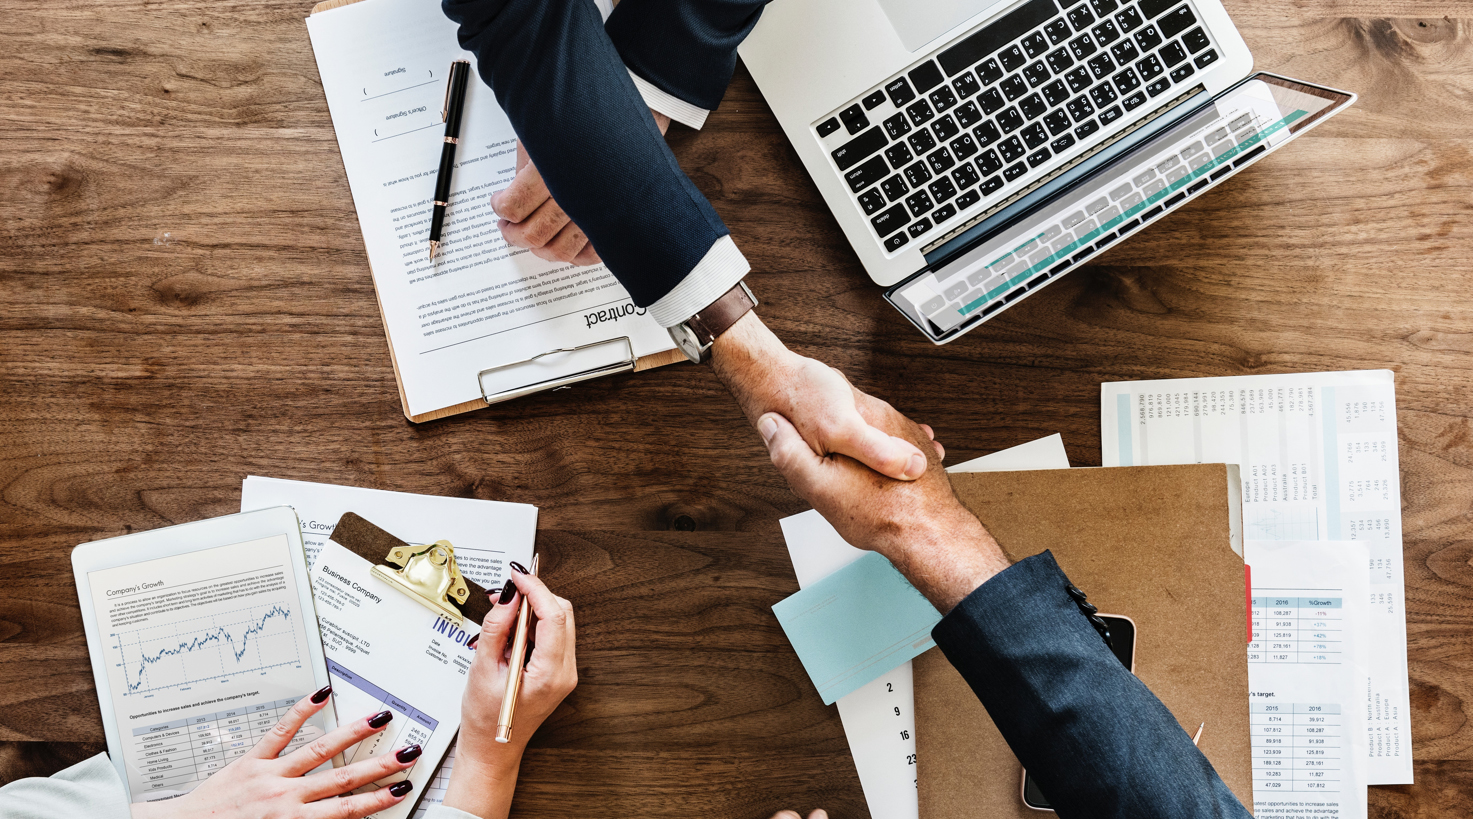 Maple-business-insurers-1